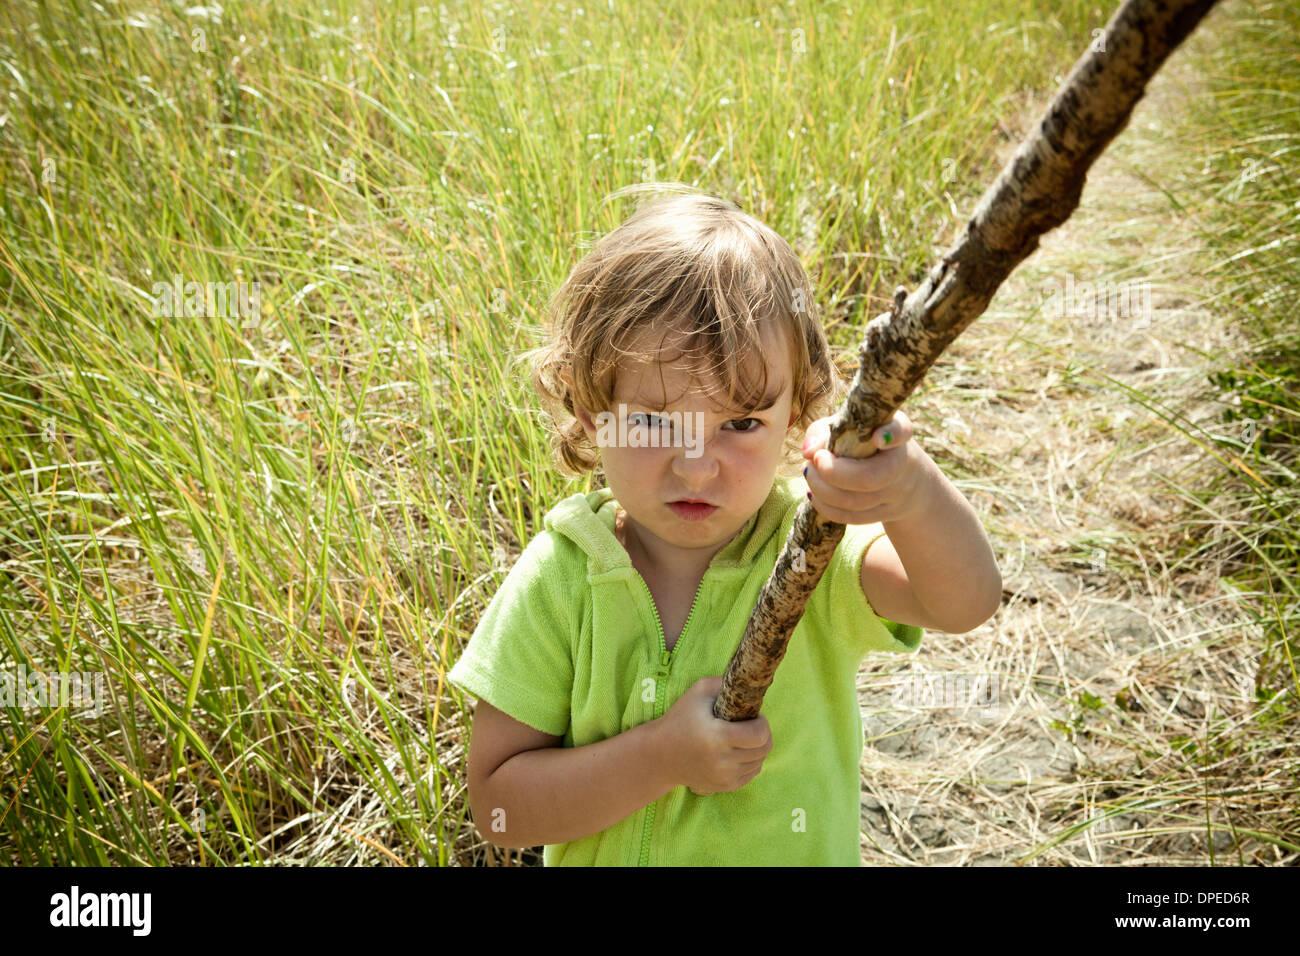 Portrait of female toddler holding long stick Stock Photo